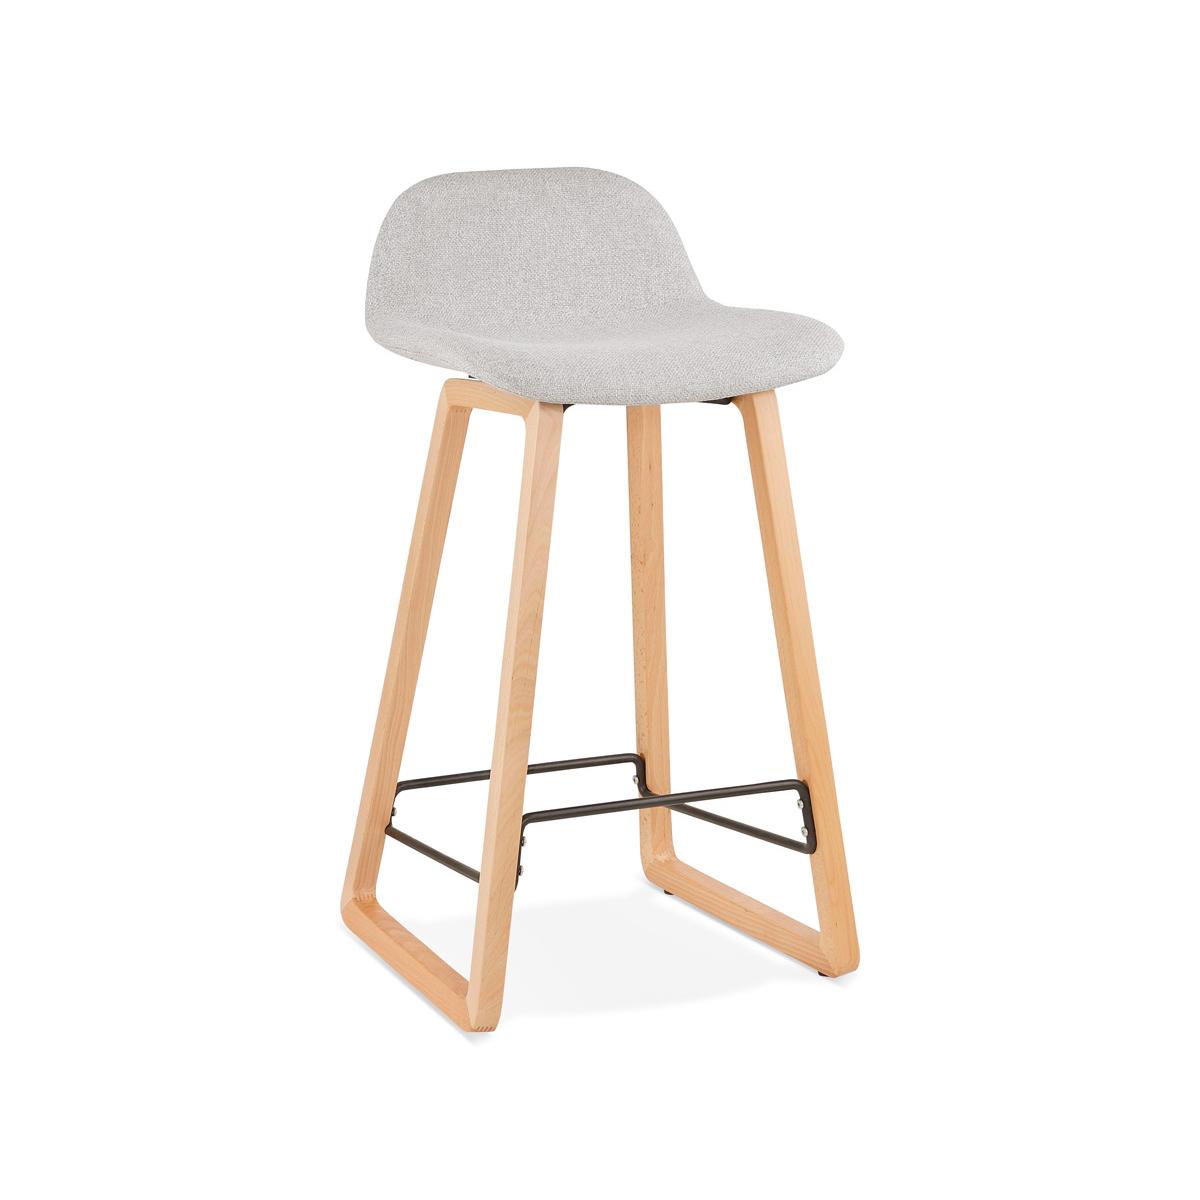 Hoker Kokoon Design Trapu Mini jasnoszary nogi naturalne